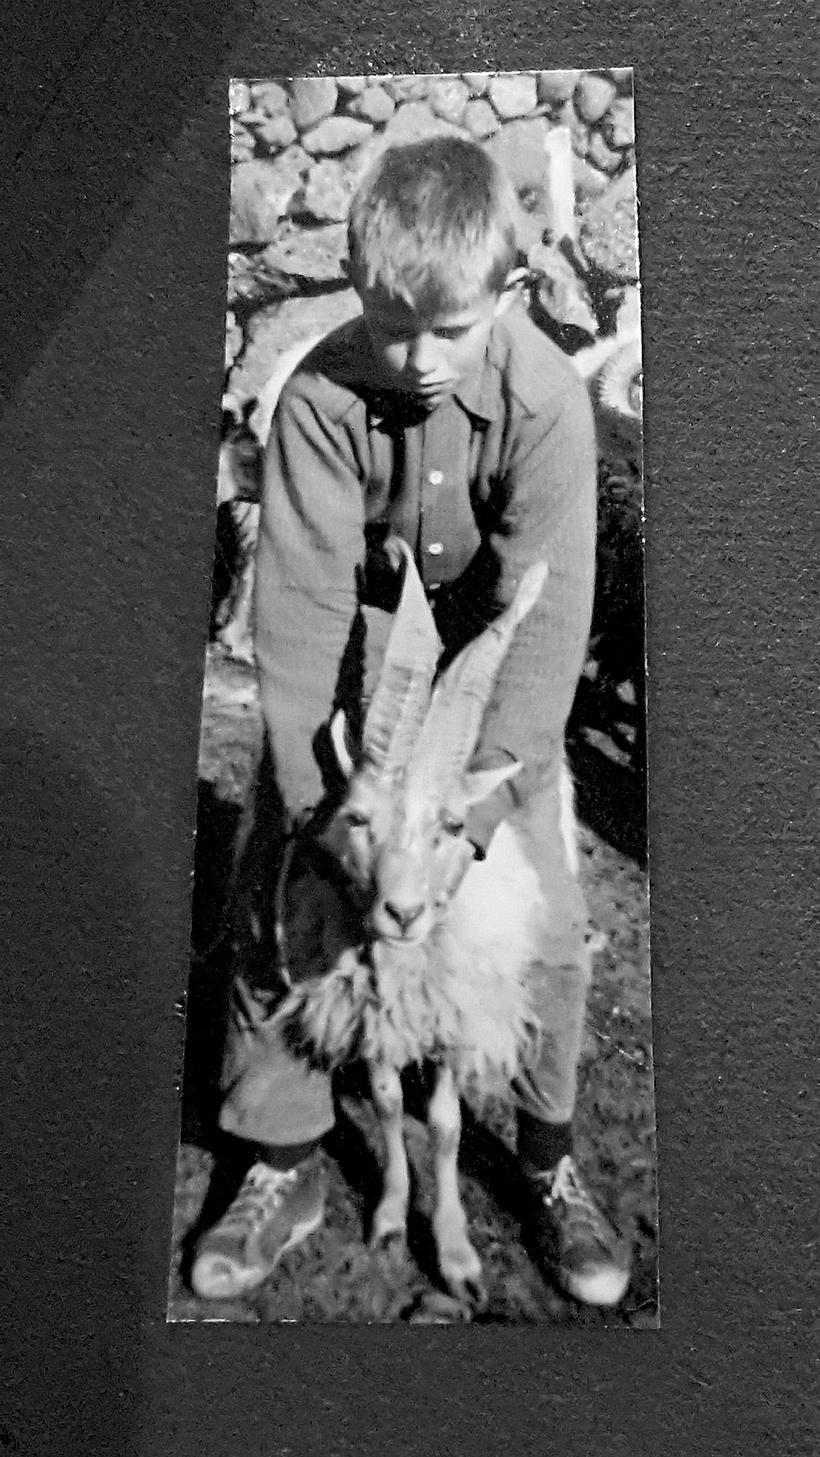 Halldór Árnason with a ram in 1961.